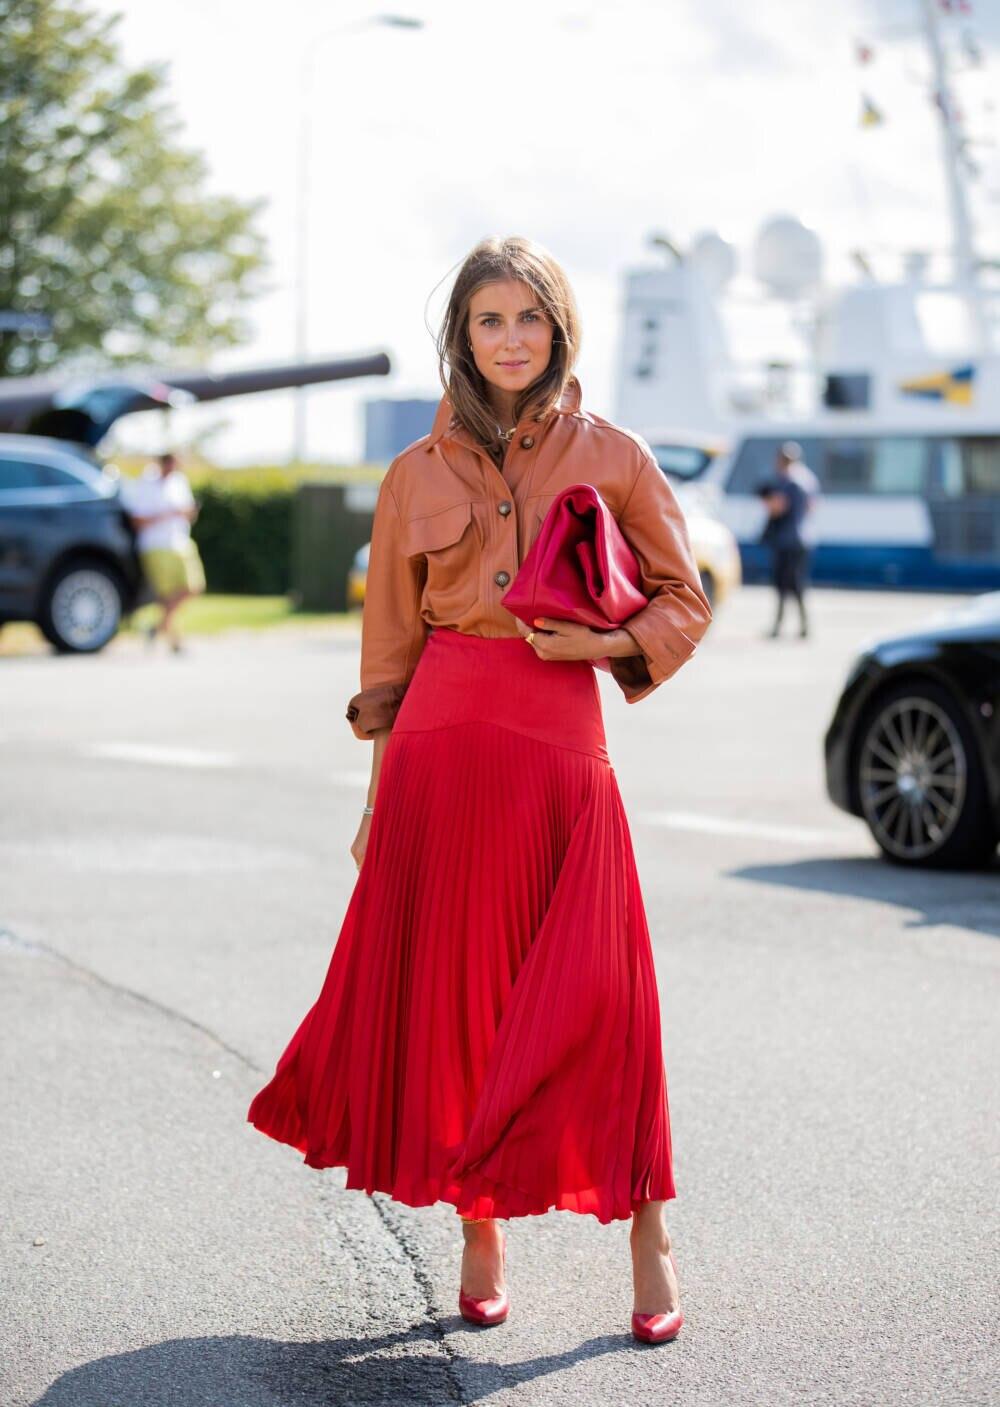 Lederhemd als Stilbruch zum Plisseerock